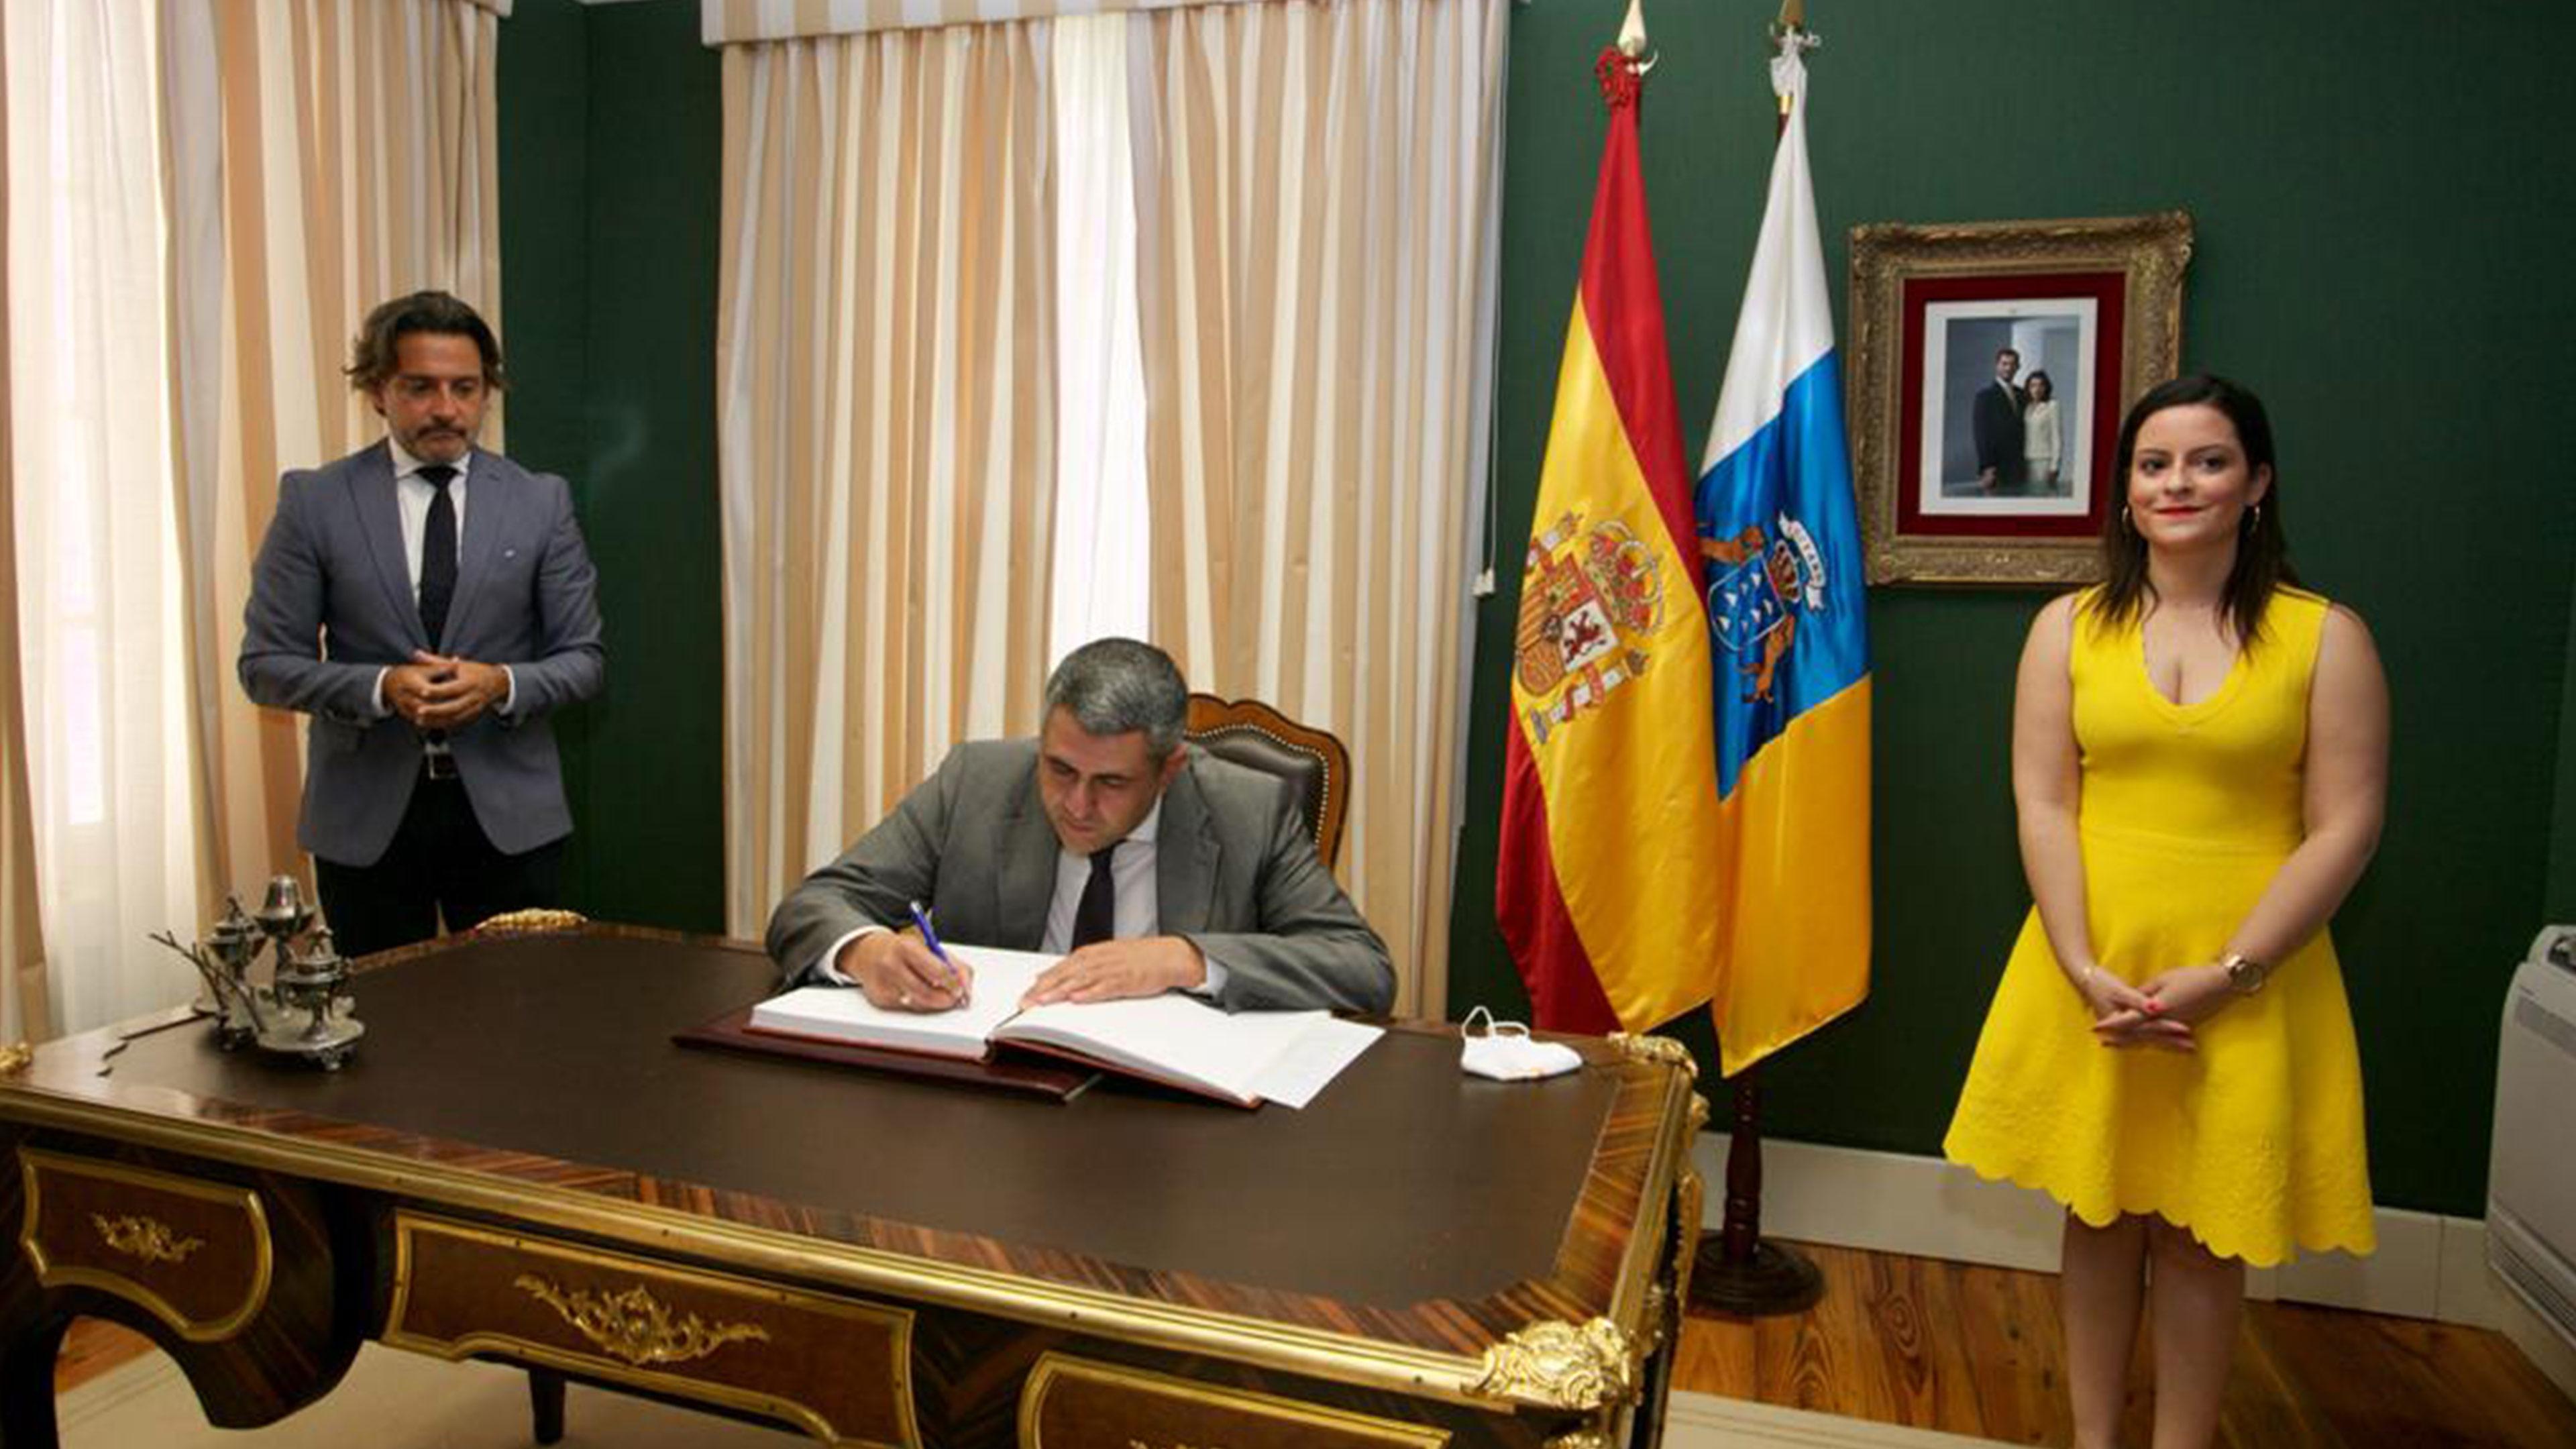 Canary island visit Secretary General UNWTO